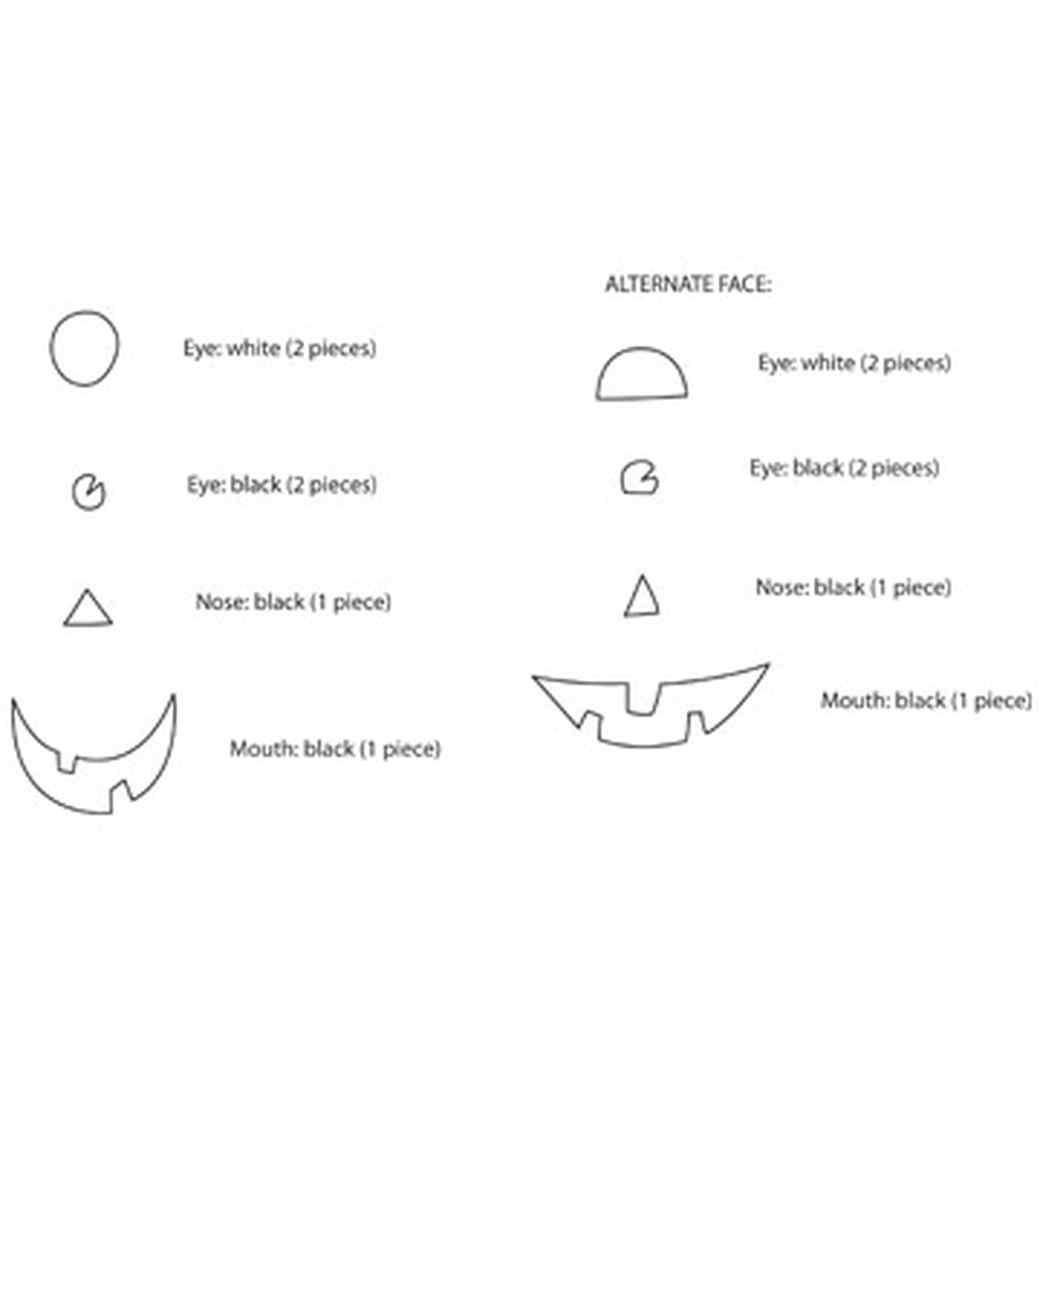 msl_1009_0910_mask_templates_acorn_boxes2_image.jpg